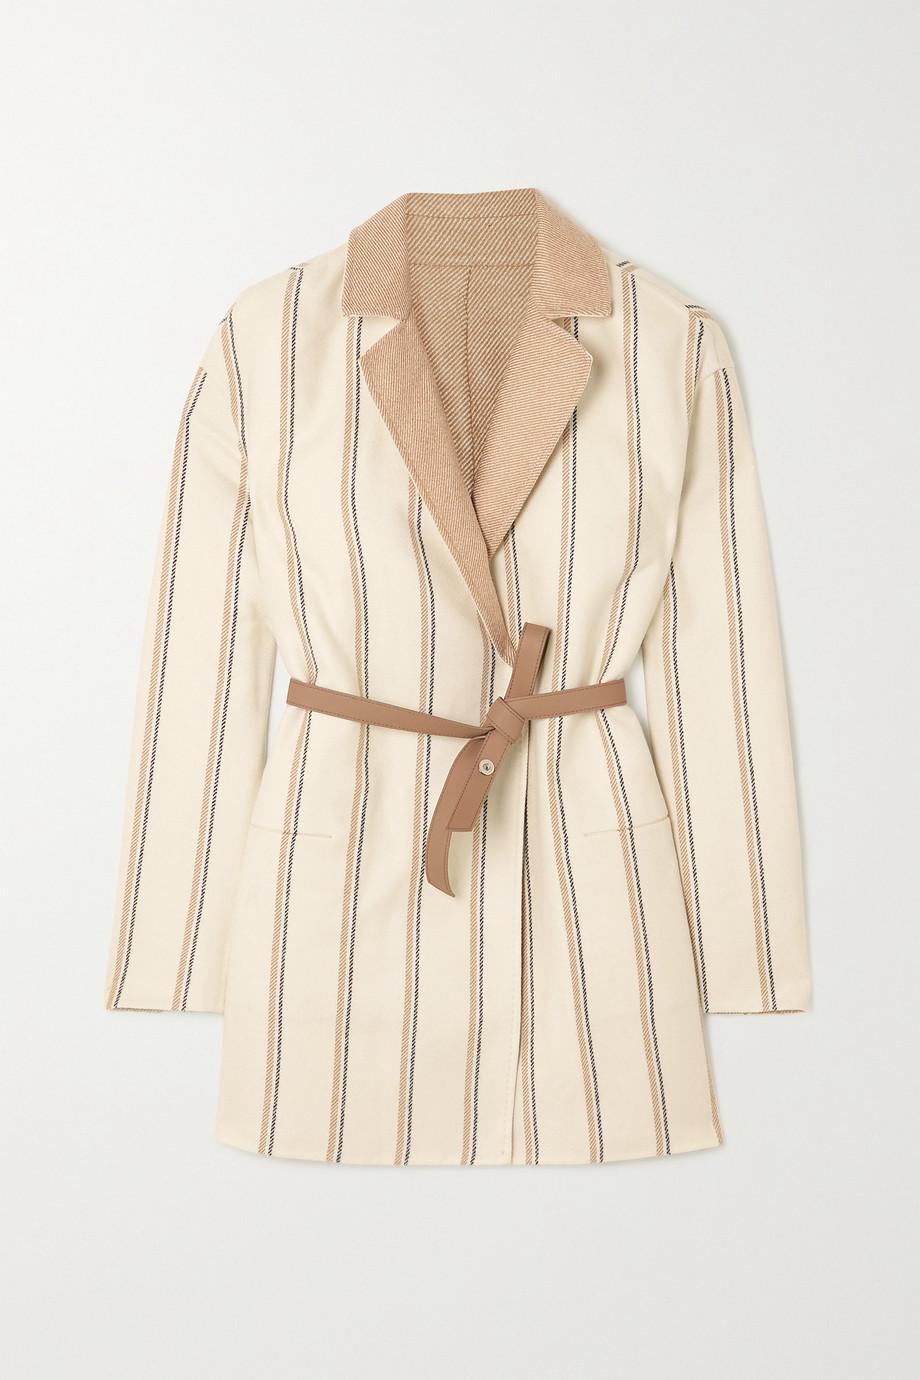 Loro Piana Jimi reversible belted striped cashmere jacket